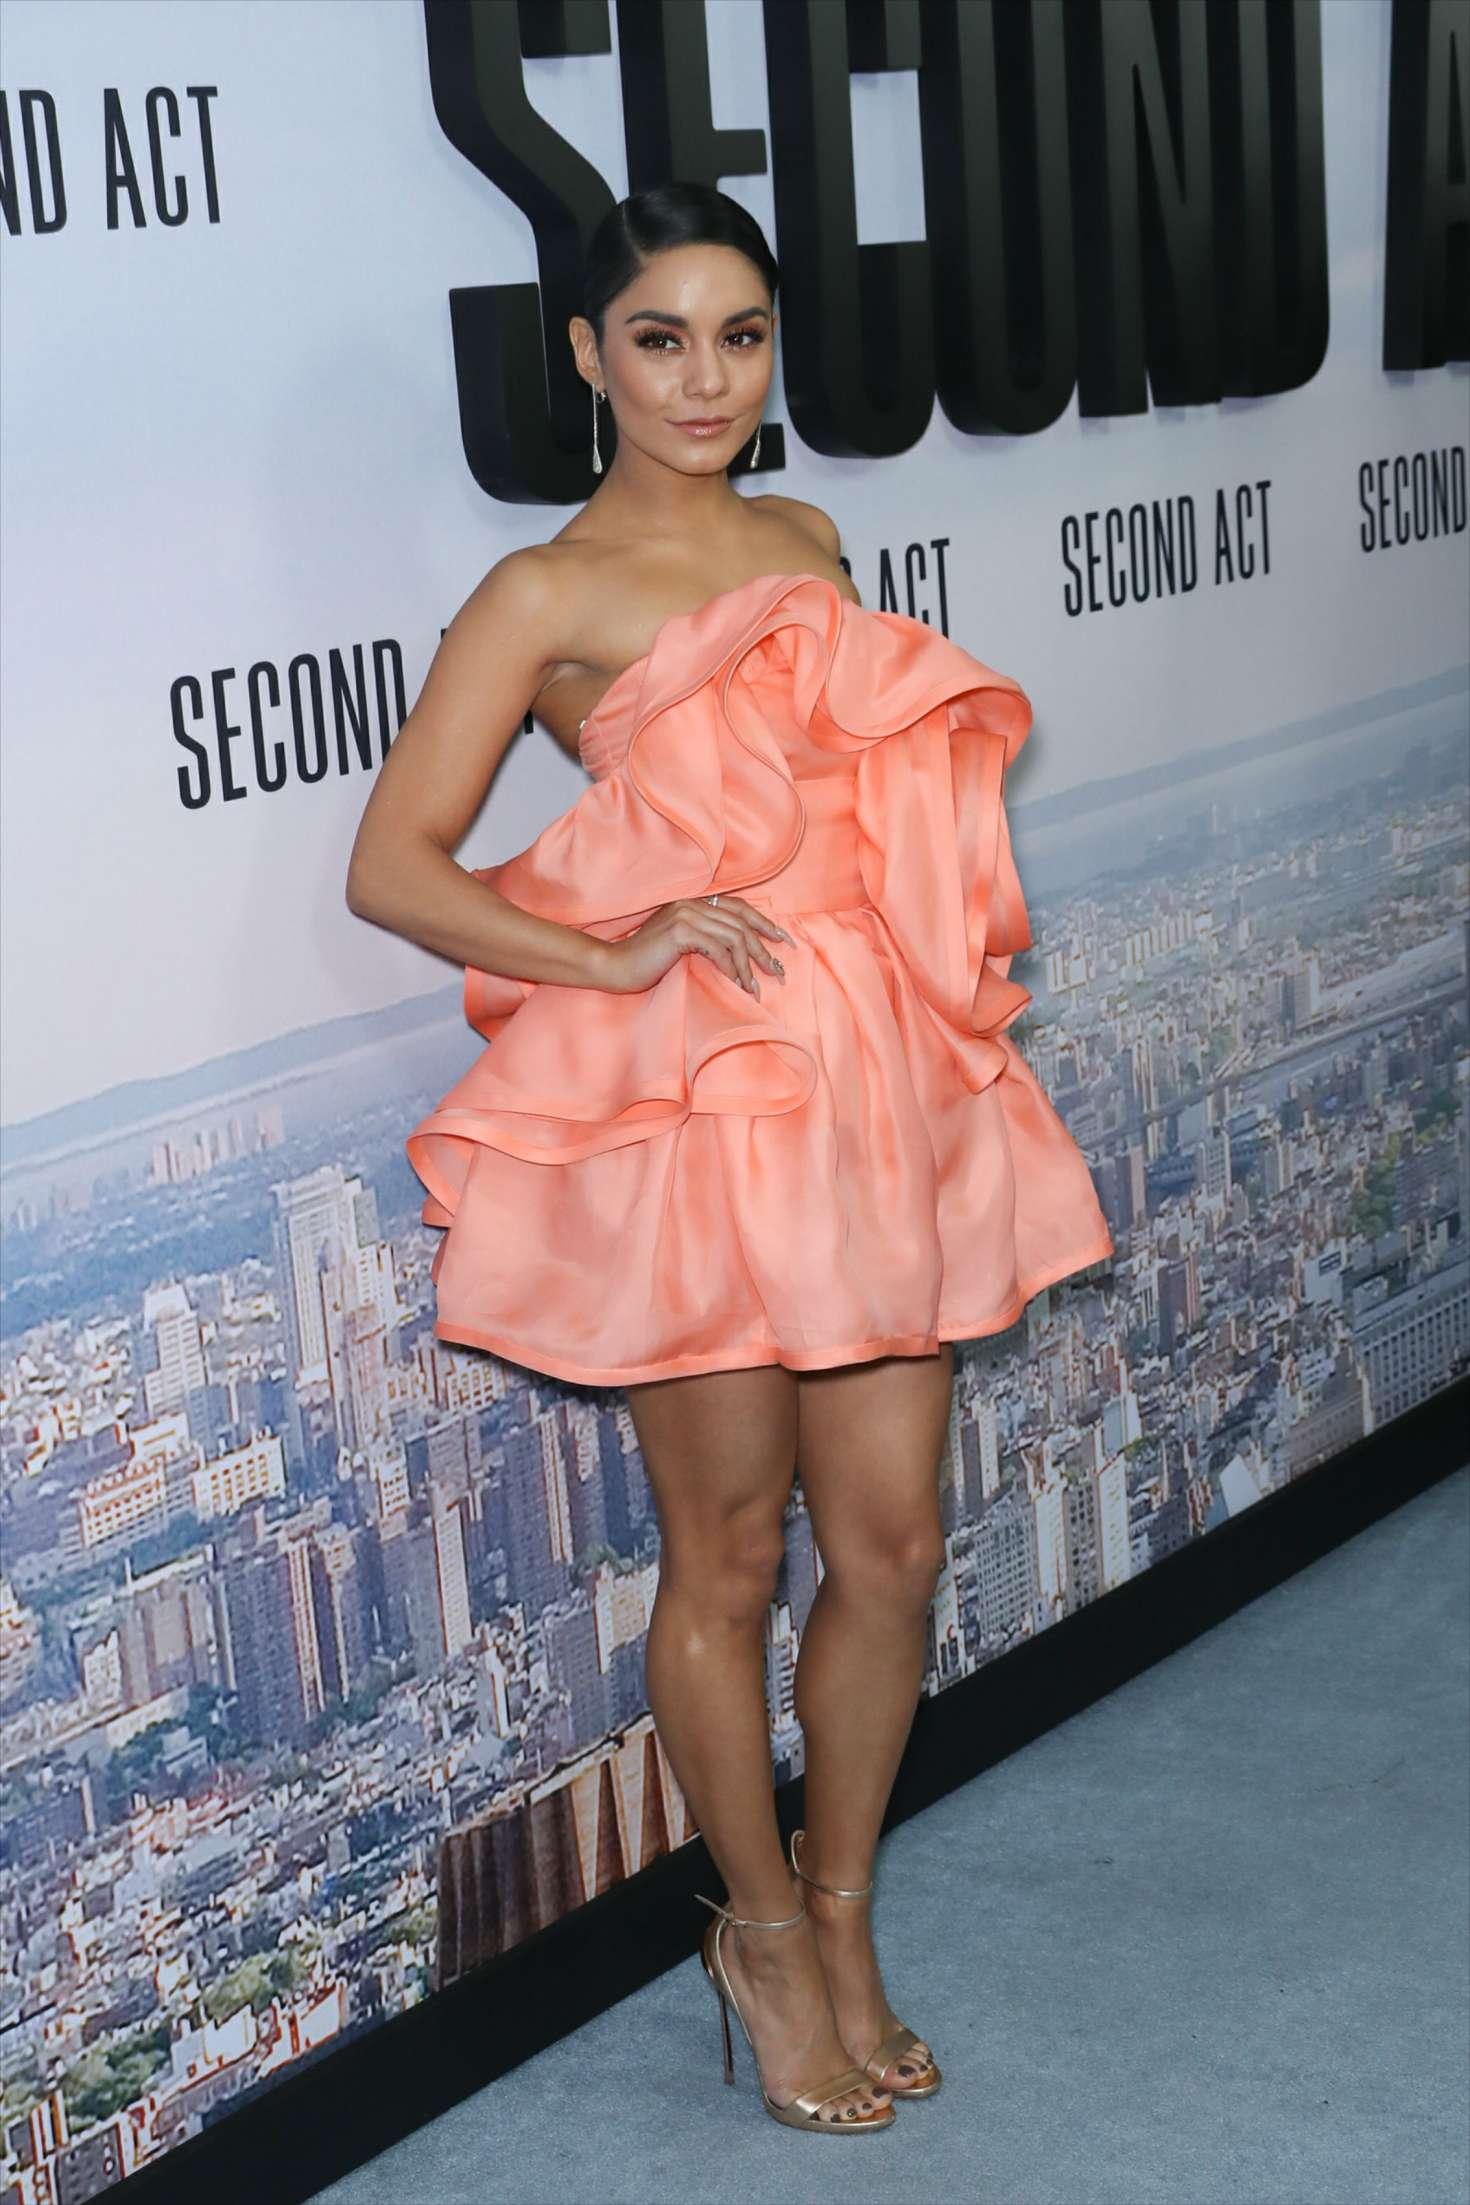 Vanessa Hudgens 2018 : Vanessa Hudgens: Second Act Premiere in NYC -10